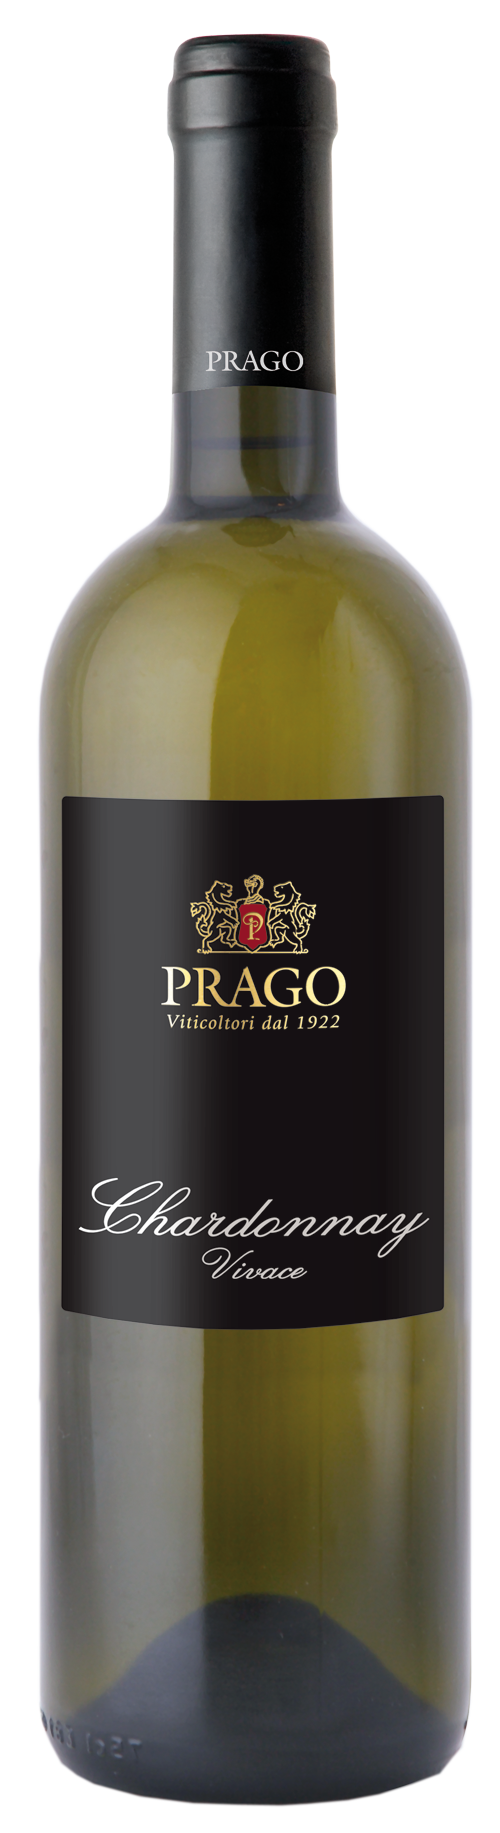 PRAGO Vini e Spumanti Oltrepò Pavese - Vini Vivaci - Chardonnay